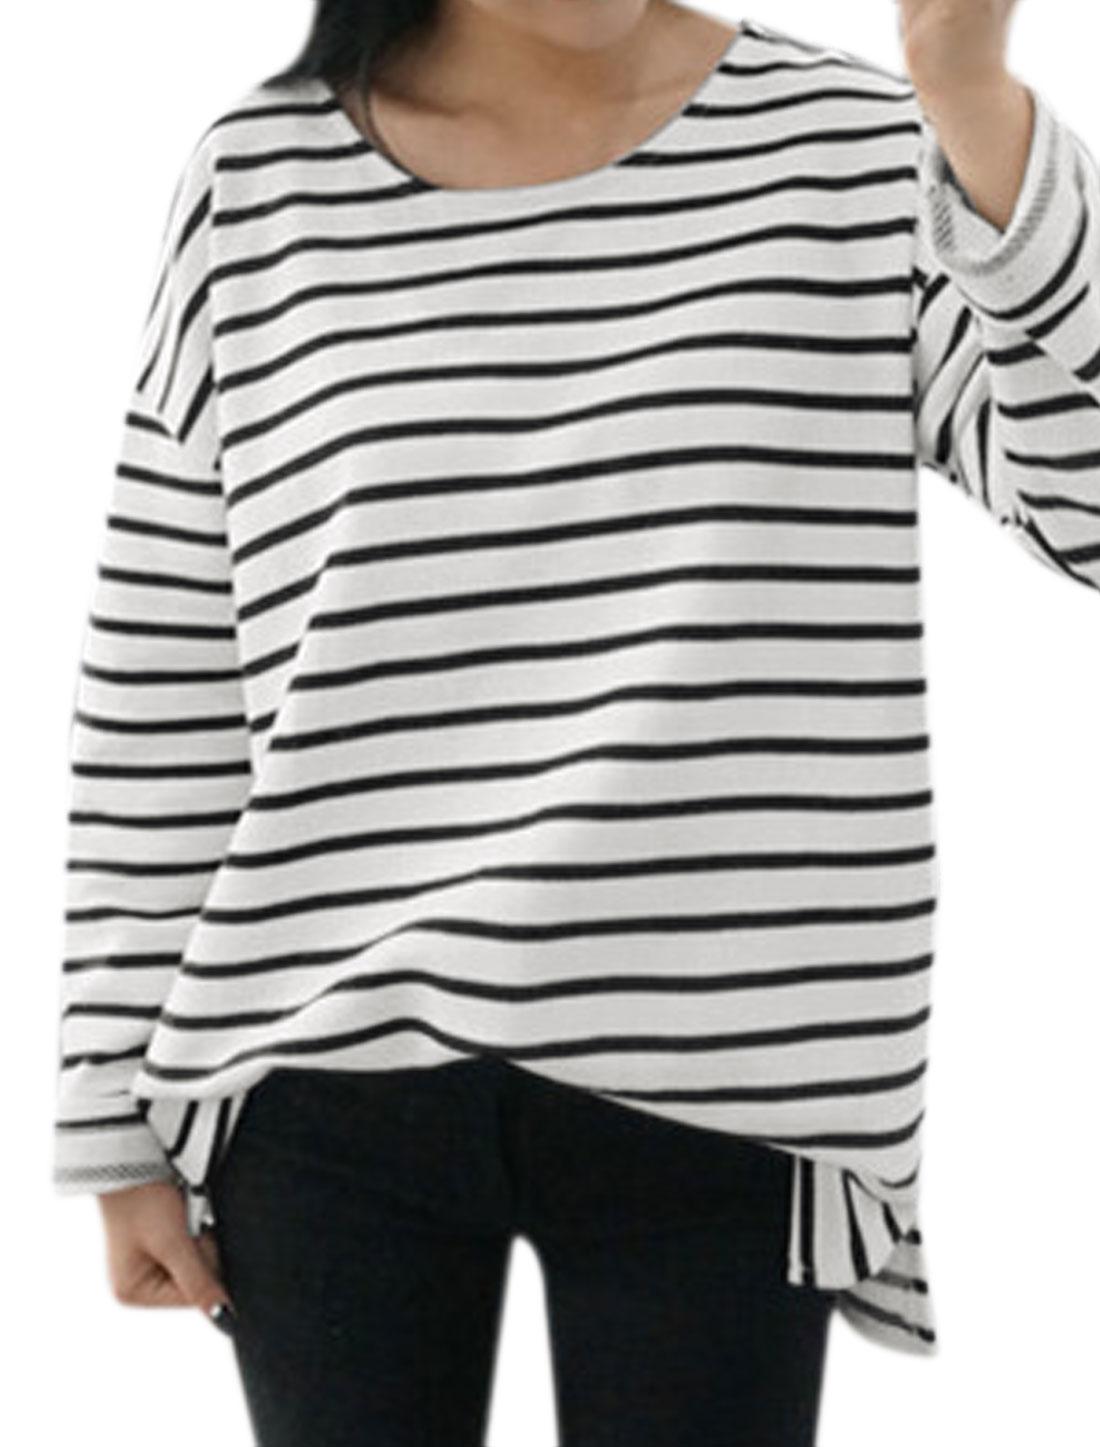 Women Round Neck Dolman Sleeves Stripes Casual Tunic T-Shirt Black S